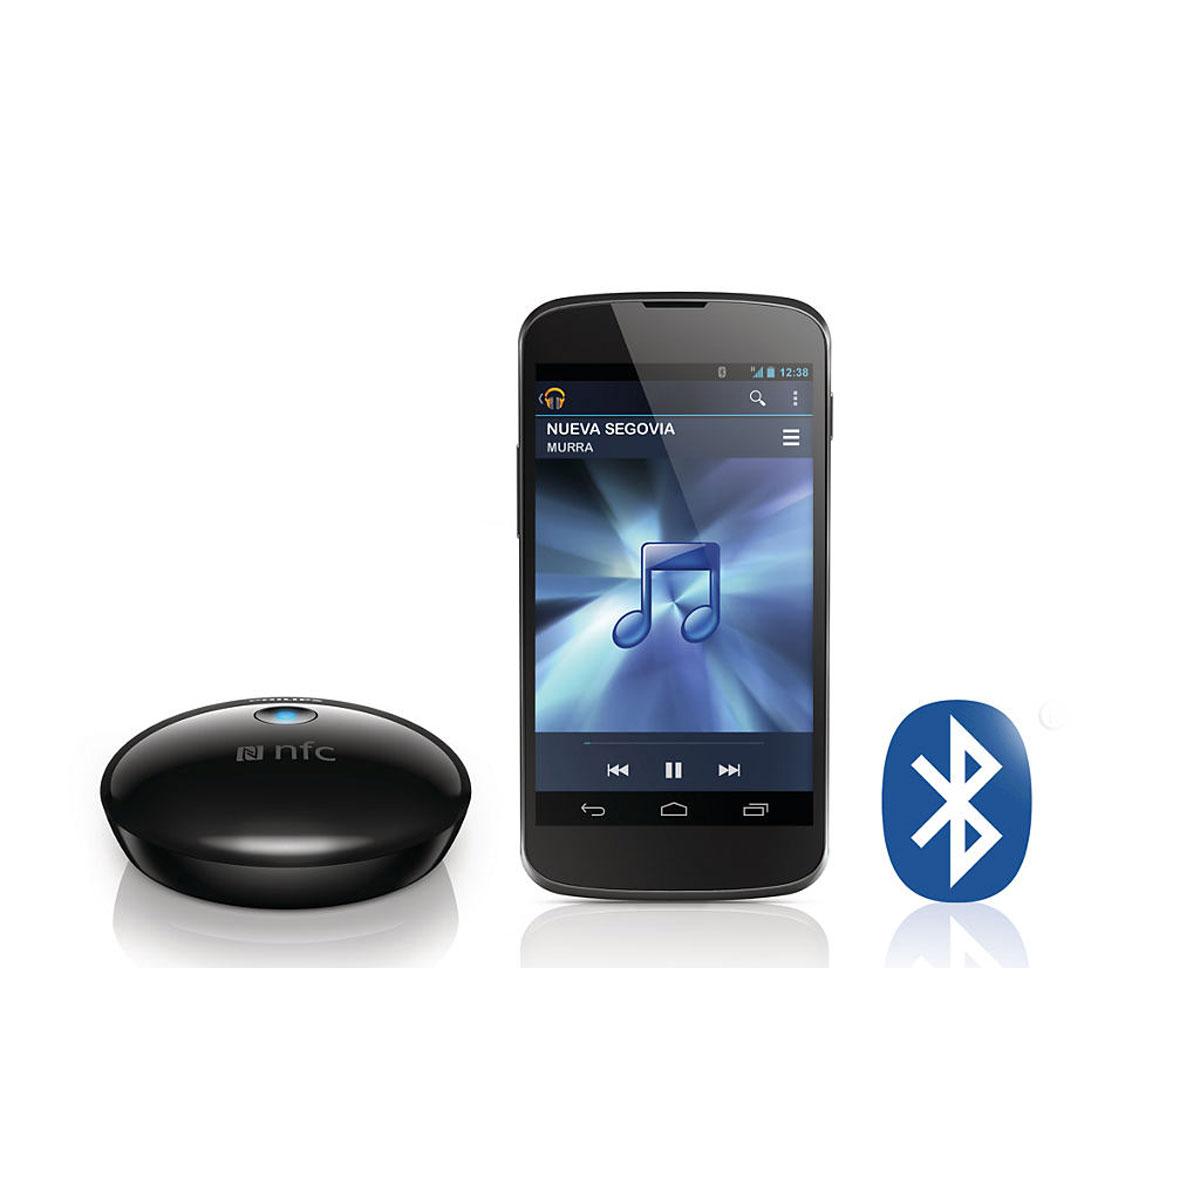 philips aea2500 serveur audio philips sur. Black Bedroom Furniture Sets. Home Design Ideas